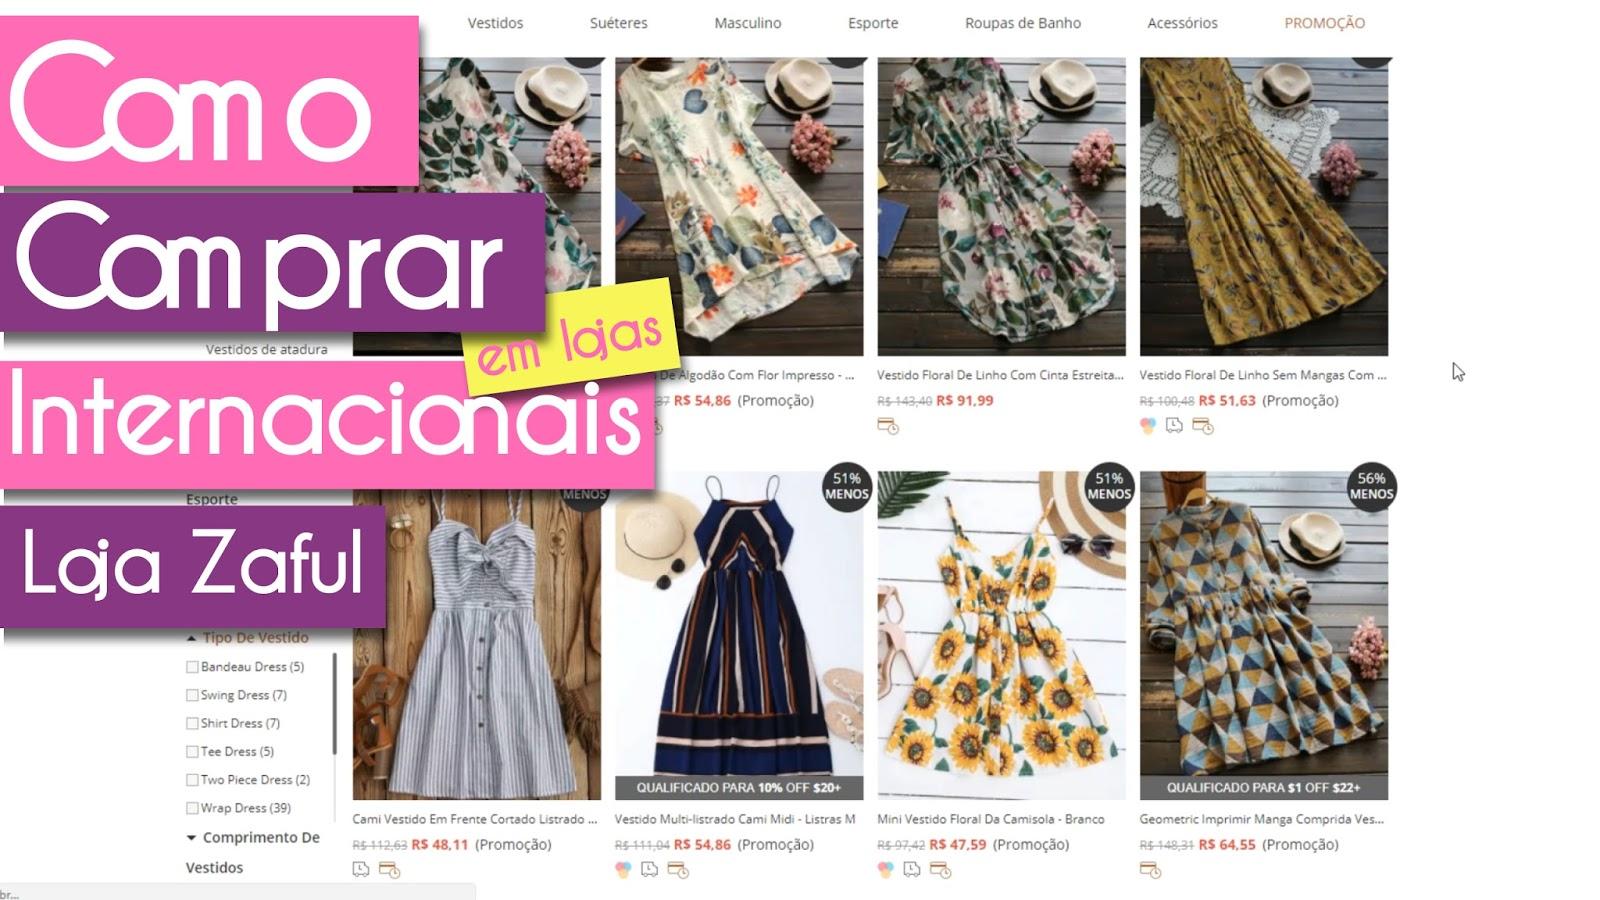 Como comprar na Loja internacional Zaful - Dicas de compras